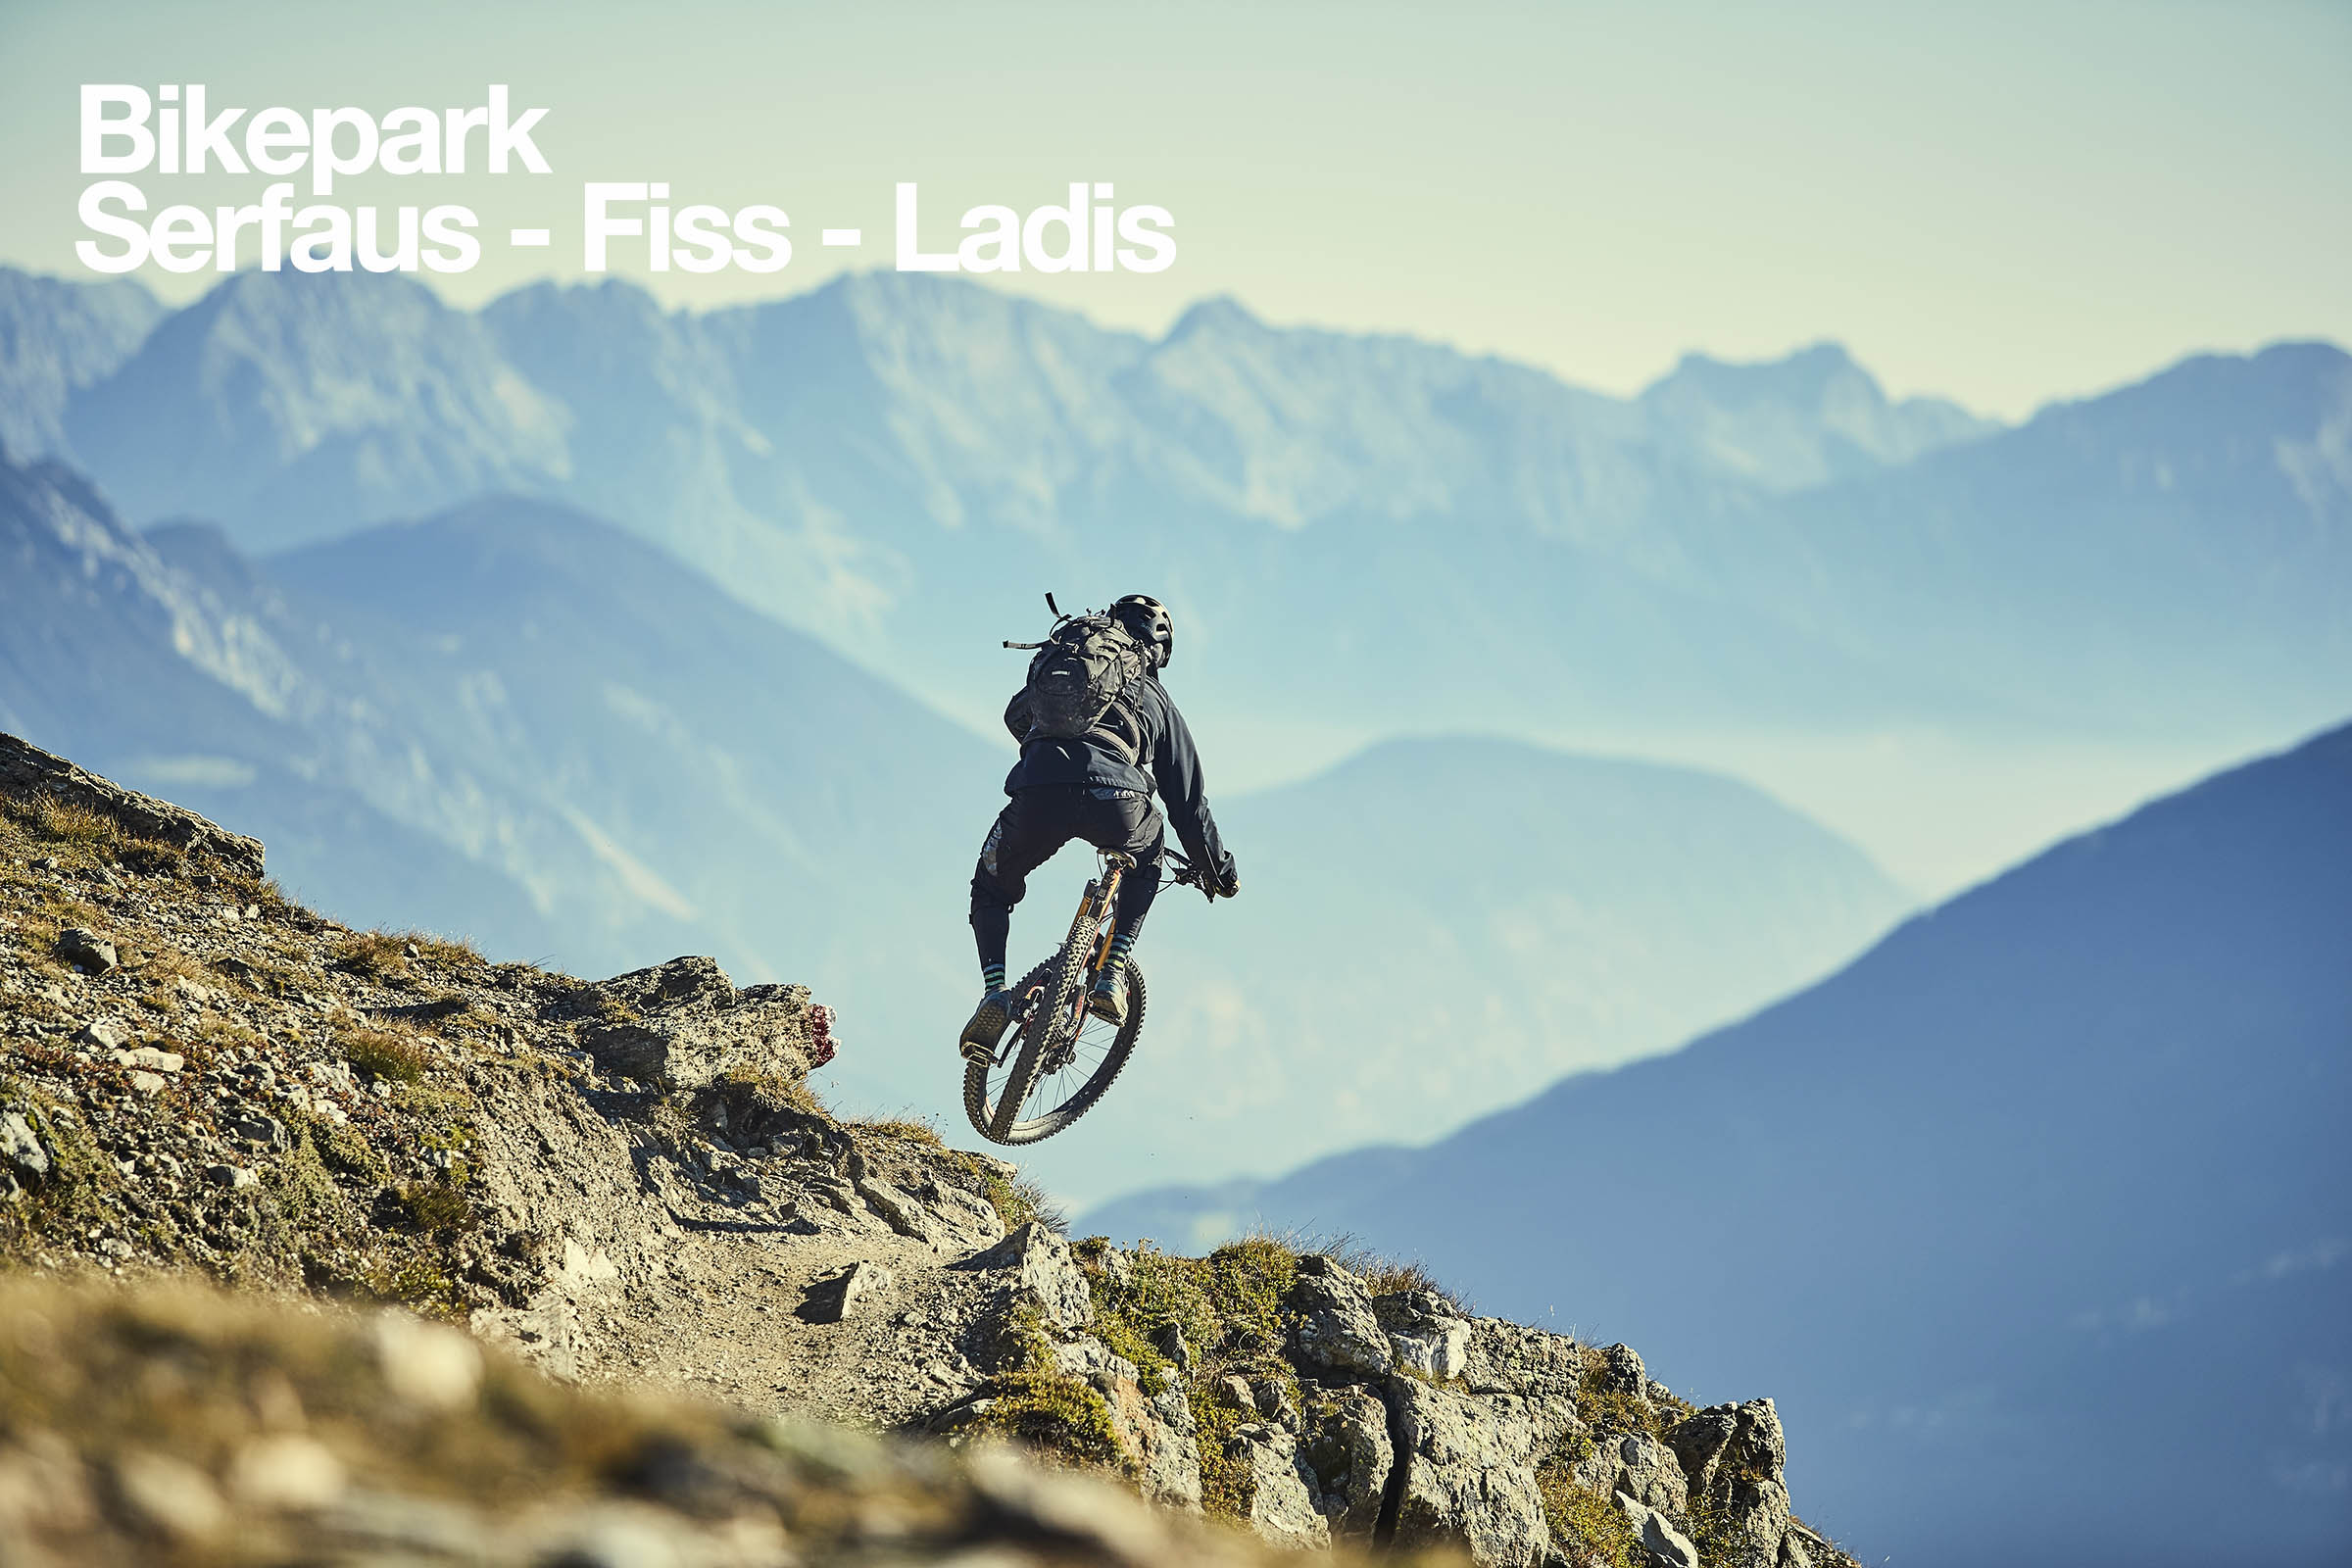 SFL_Frommestrail Serfaus-Fiss-Ladis